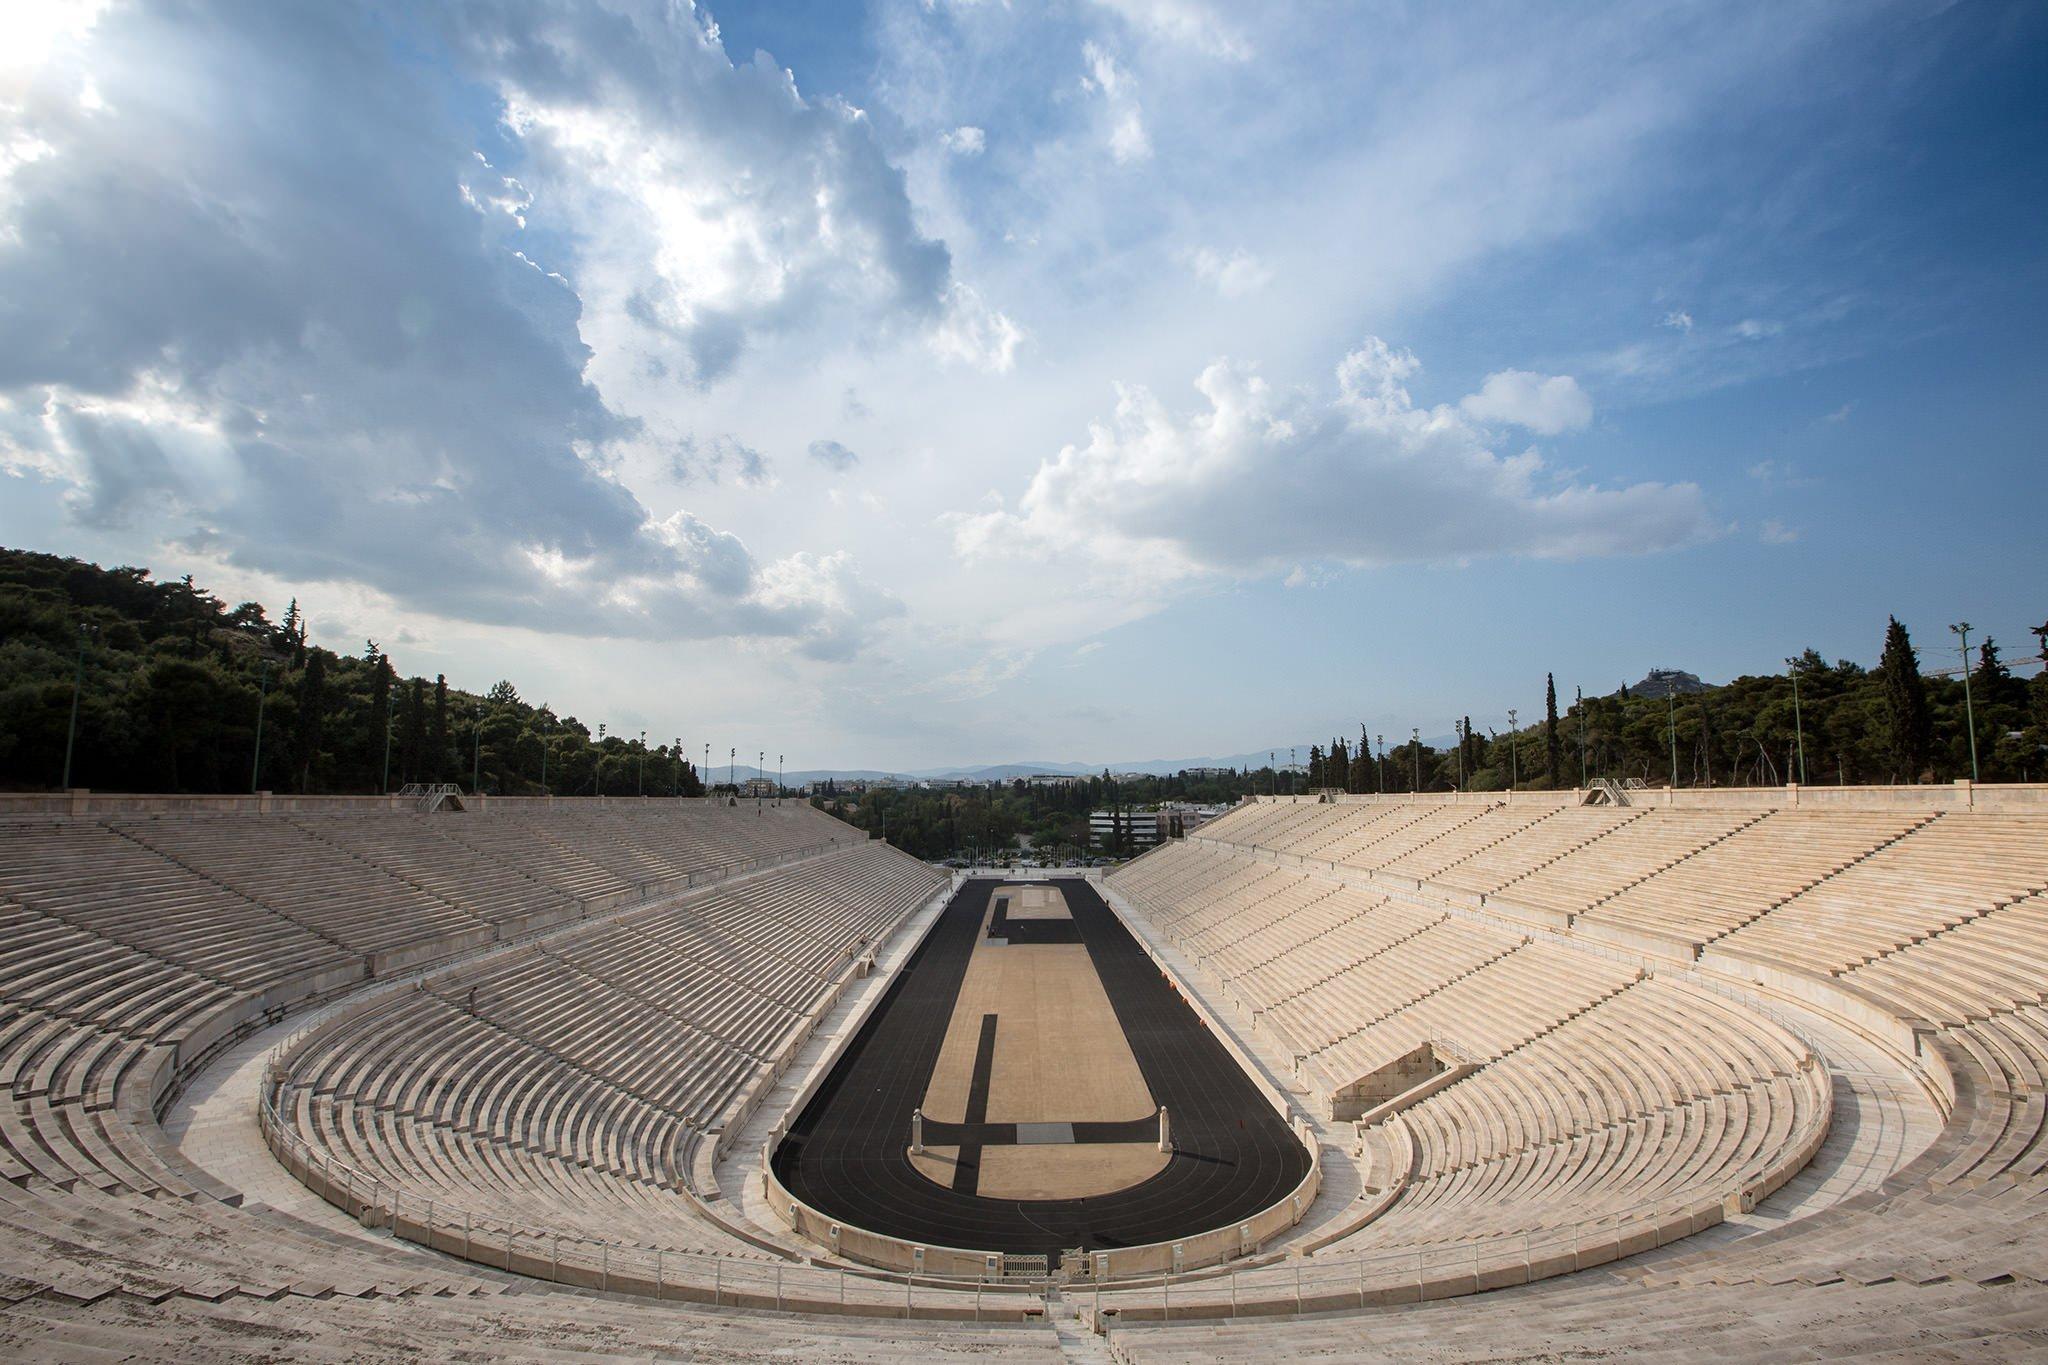 Daily Athens Photography Tour - Panathinaikon stadium